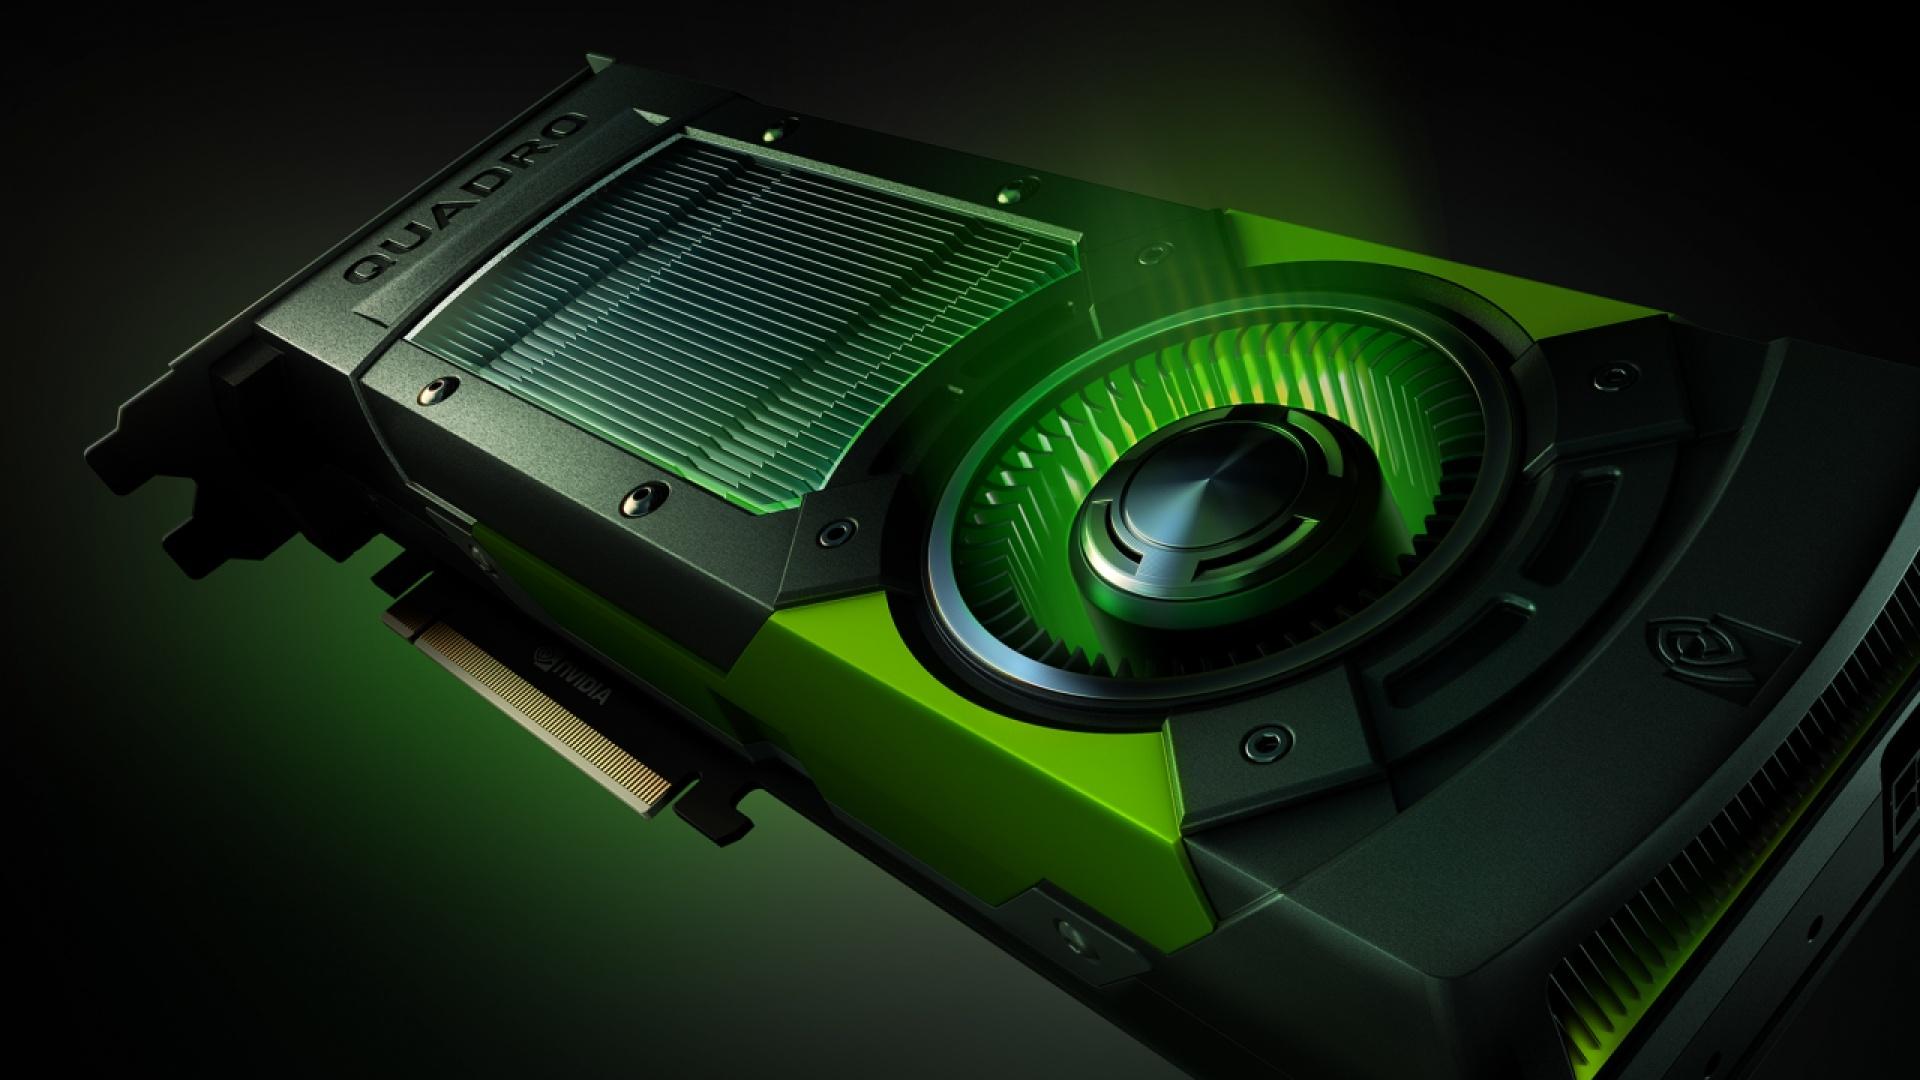 NVIDIA Quadro Pro Graphics Workstations